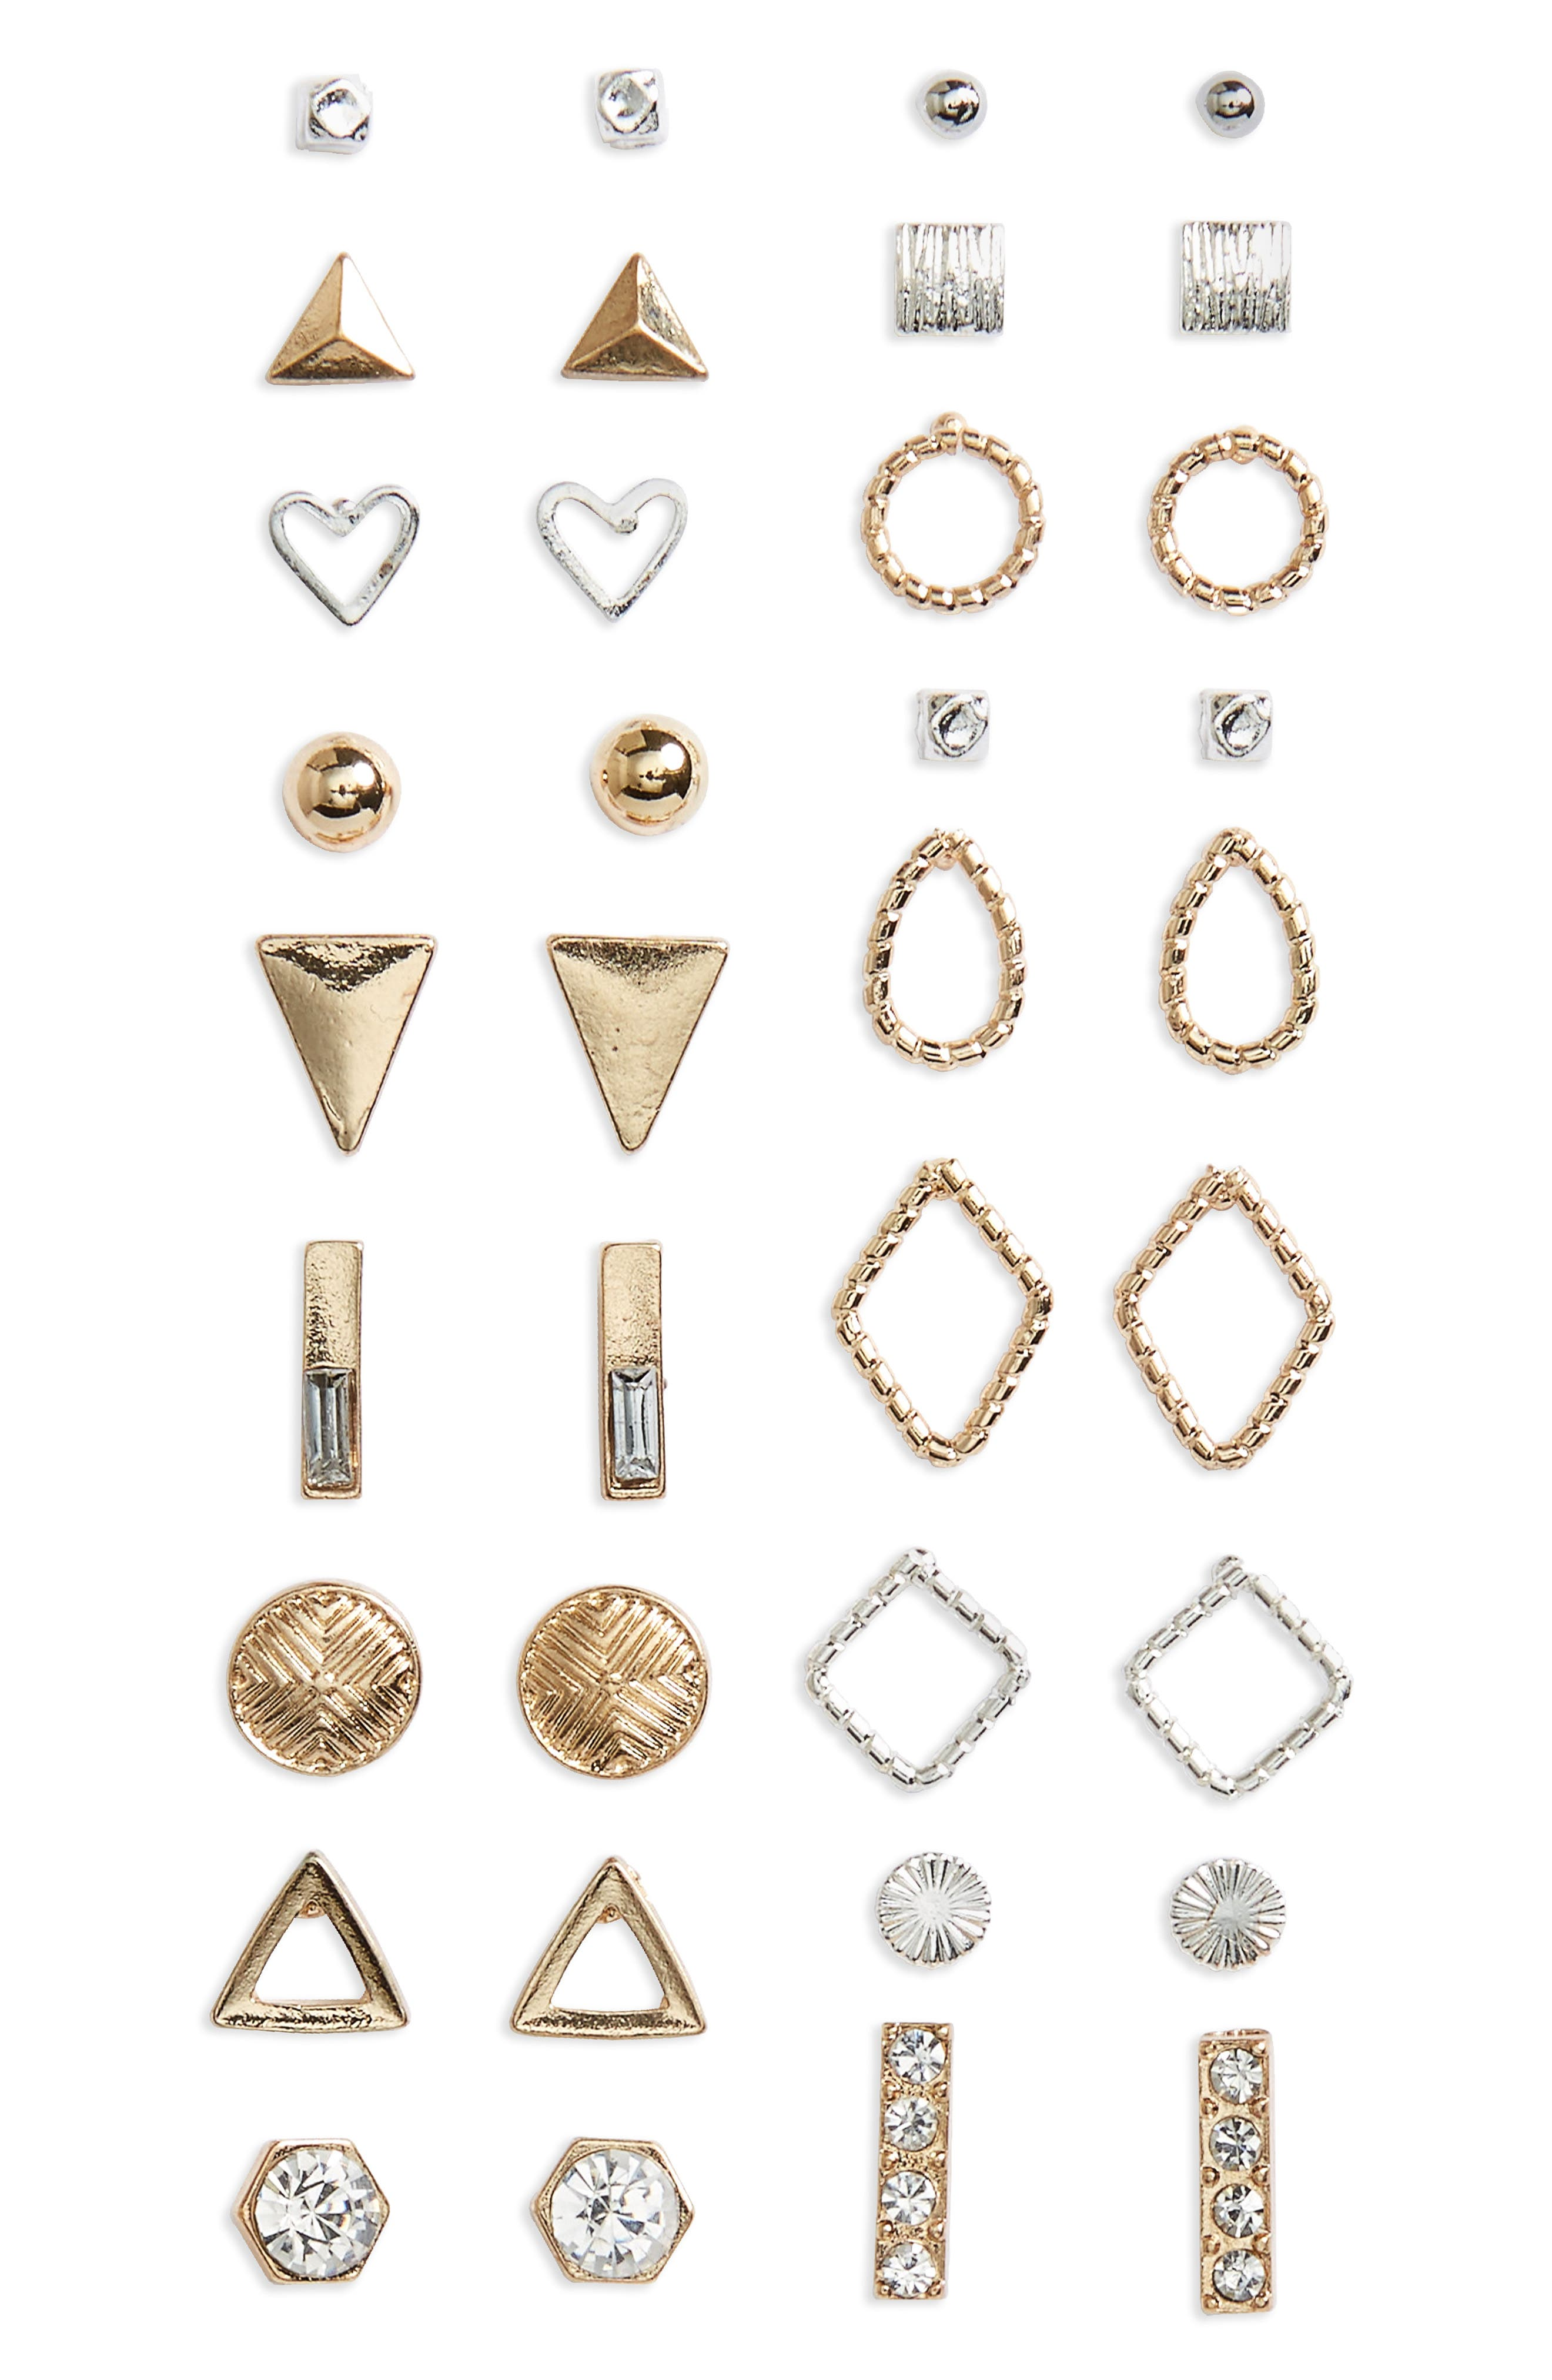 18-Pack Mixed Metal Earrings,                             Main thumbnail 1, color,                             710